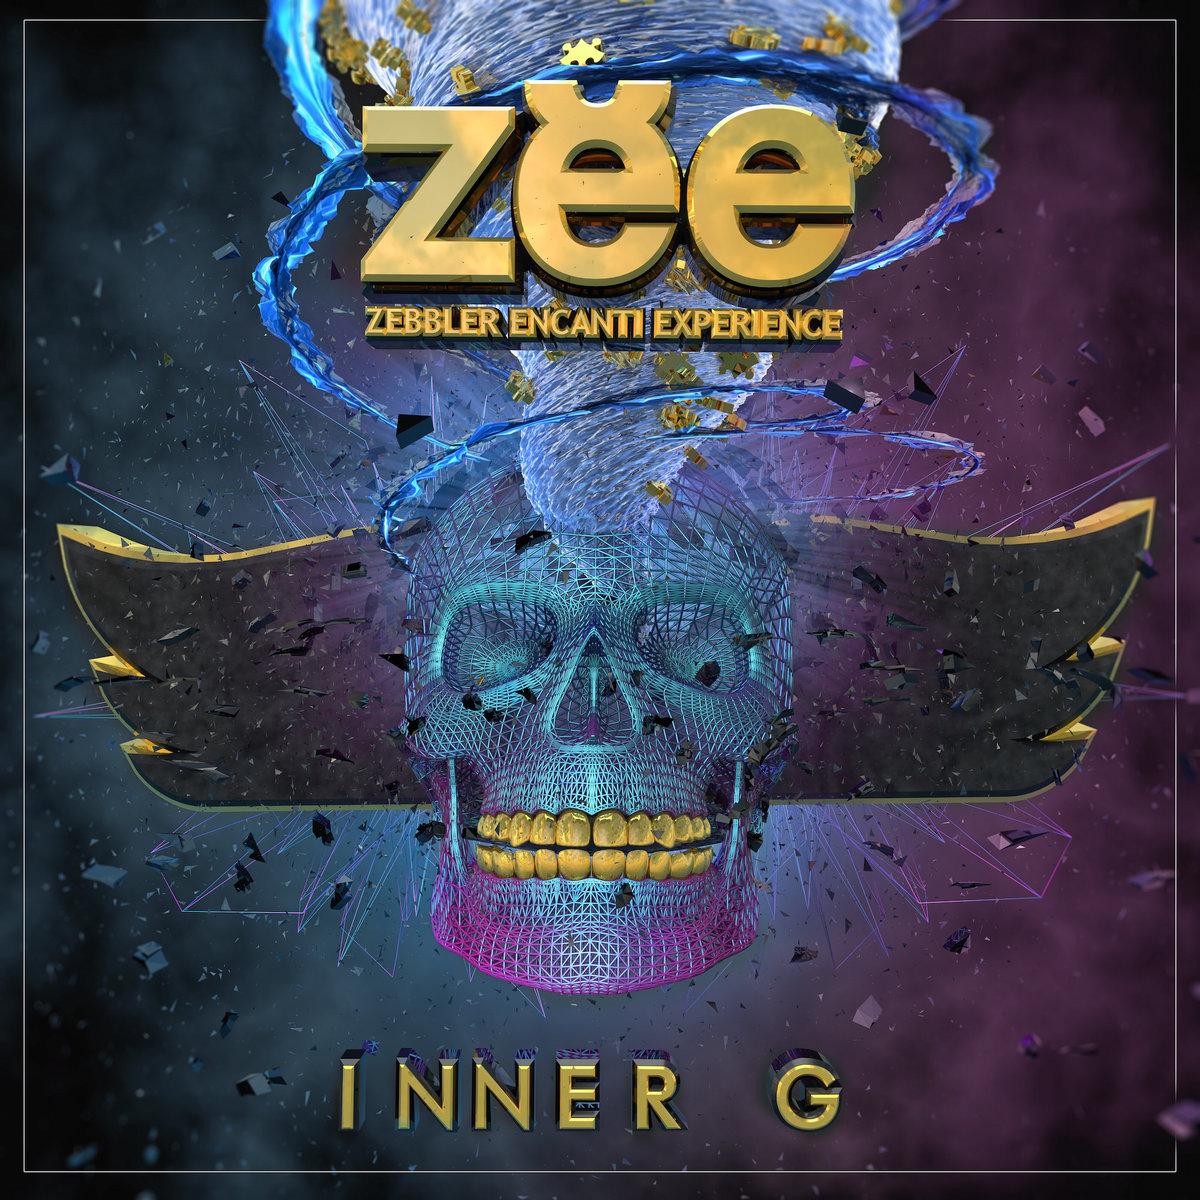 Zebbler Encanti Experience feat. Olivia Dawn - Get Psychic @ 'Inner G' album (psycehdelic, dubstep)